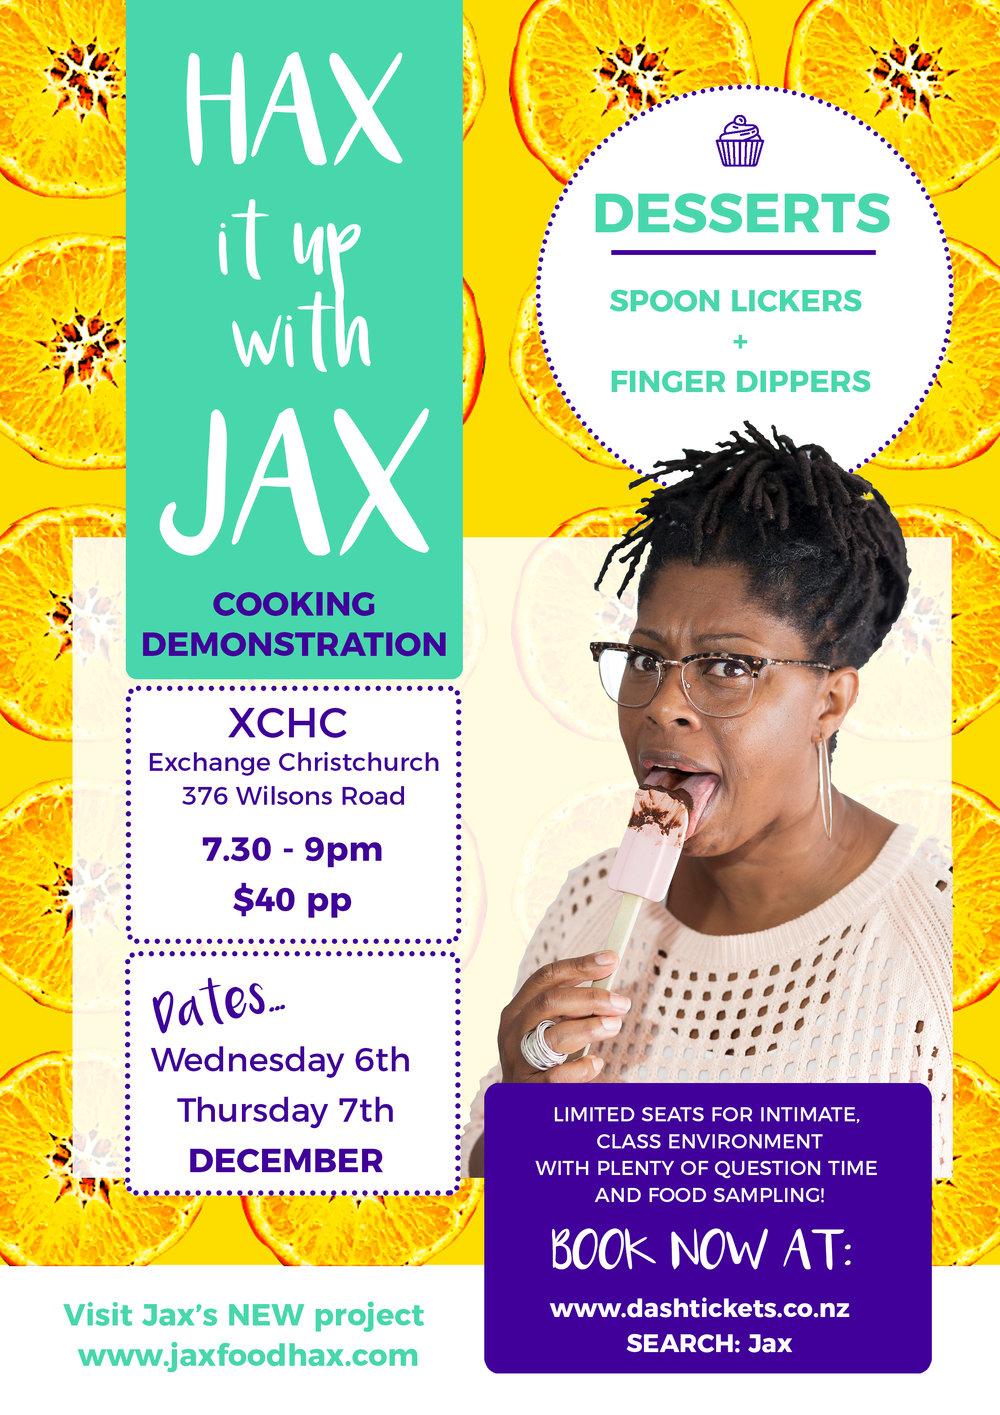 Hax it up with Jax series A4 flyer - desserts.jpg